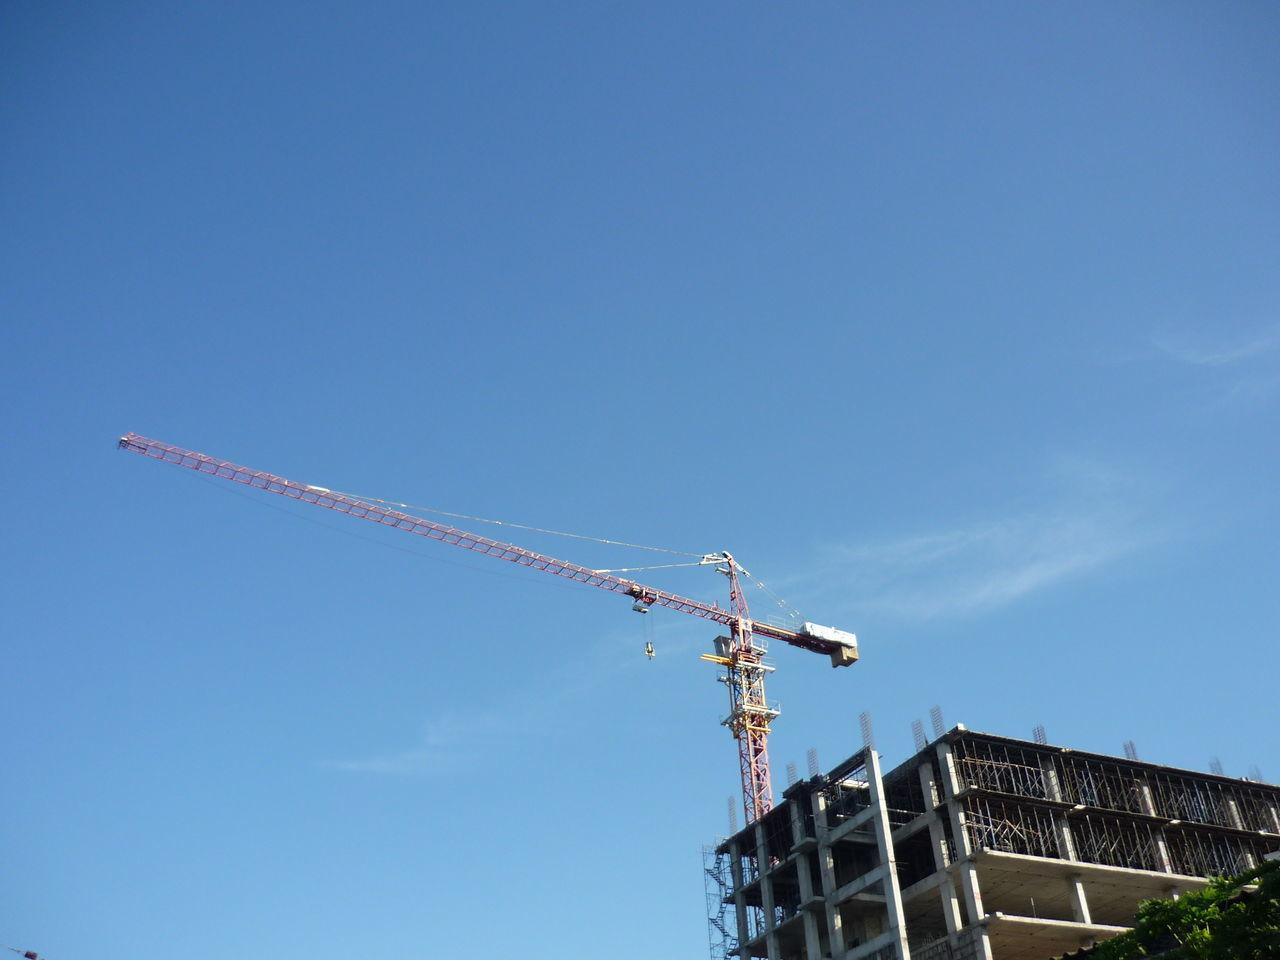 Bau Construcción Construction Construção Costruzione Crane Crane - Construction Machinery строительство 建設 施工 구성